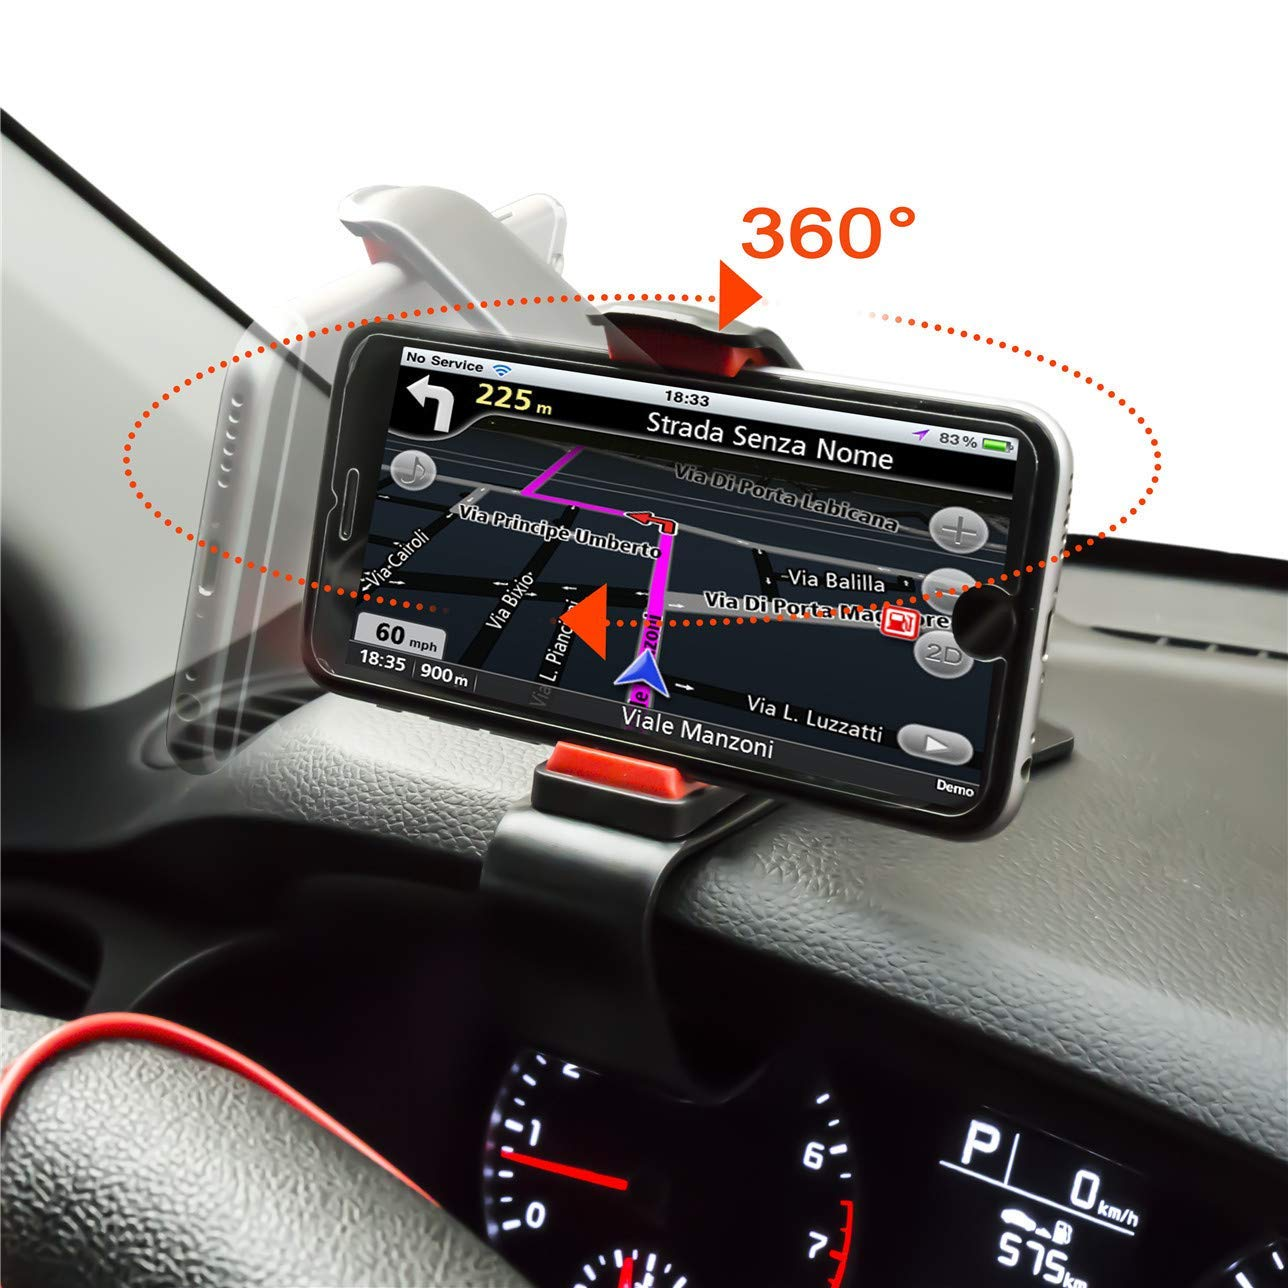 ZOORE Soporte Teléfono Coche para Salpicadero,360 HUD Soporte Móvil Coche GPS, Pinza Fuerte de Base Titular Móvil Vehícul Compatible iPhone 6/6s/5/7/8Plus/X,Huawei, Samsung, HTC LG 3.0\